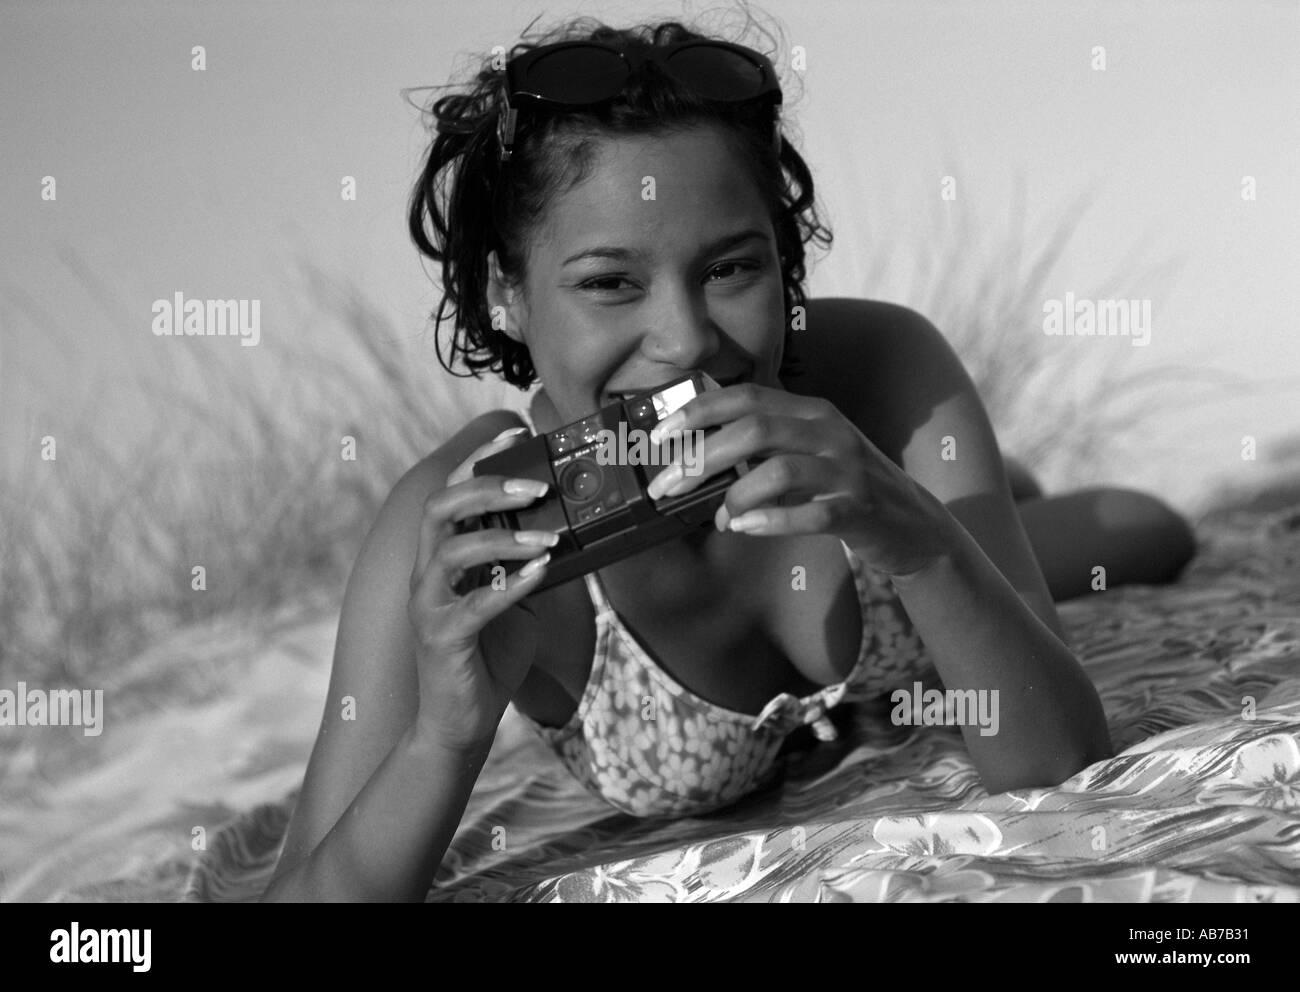 Woman on beach - Stock Image